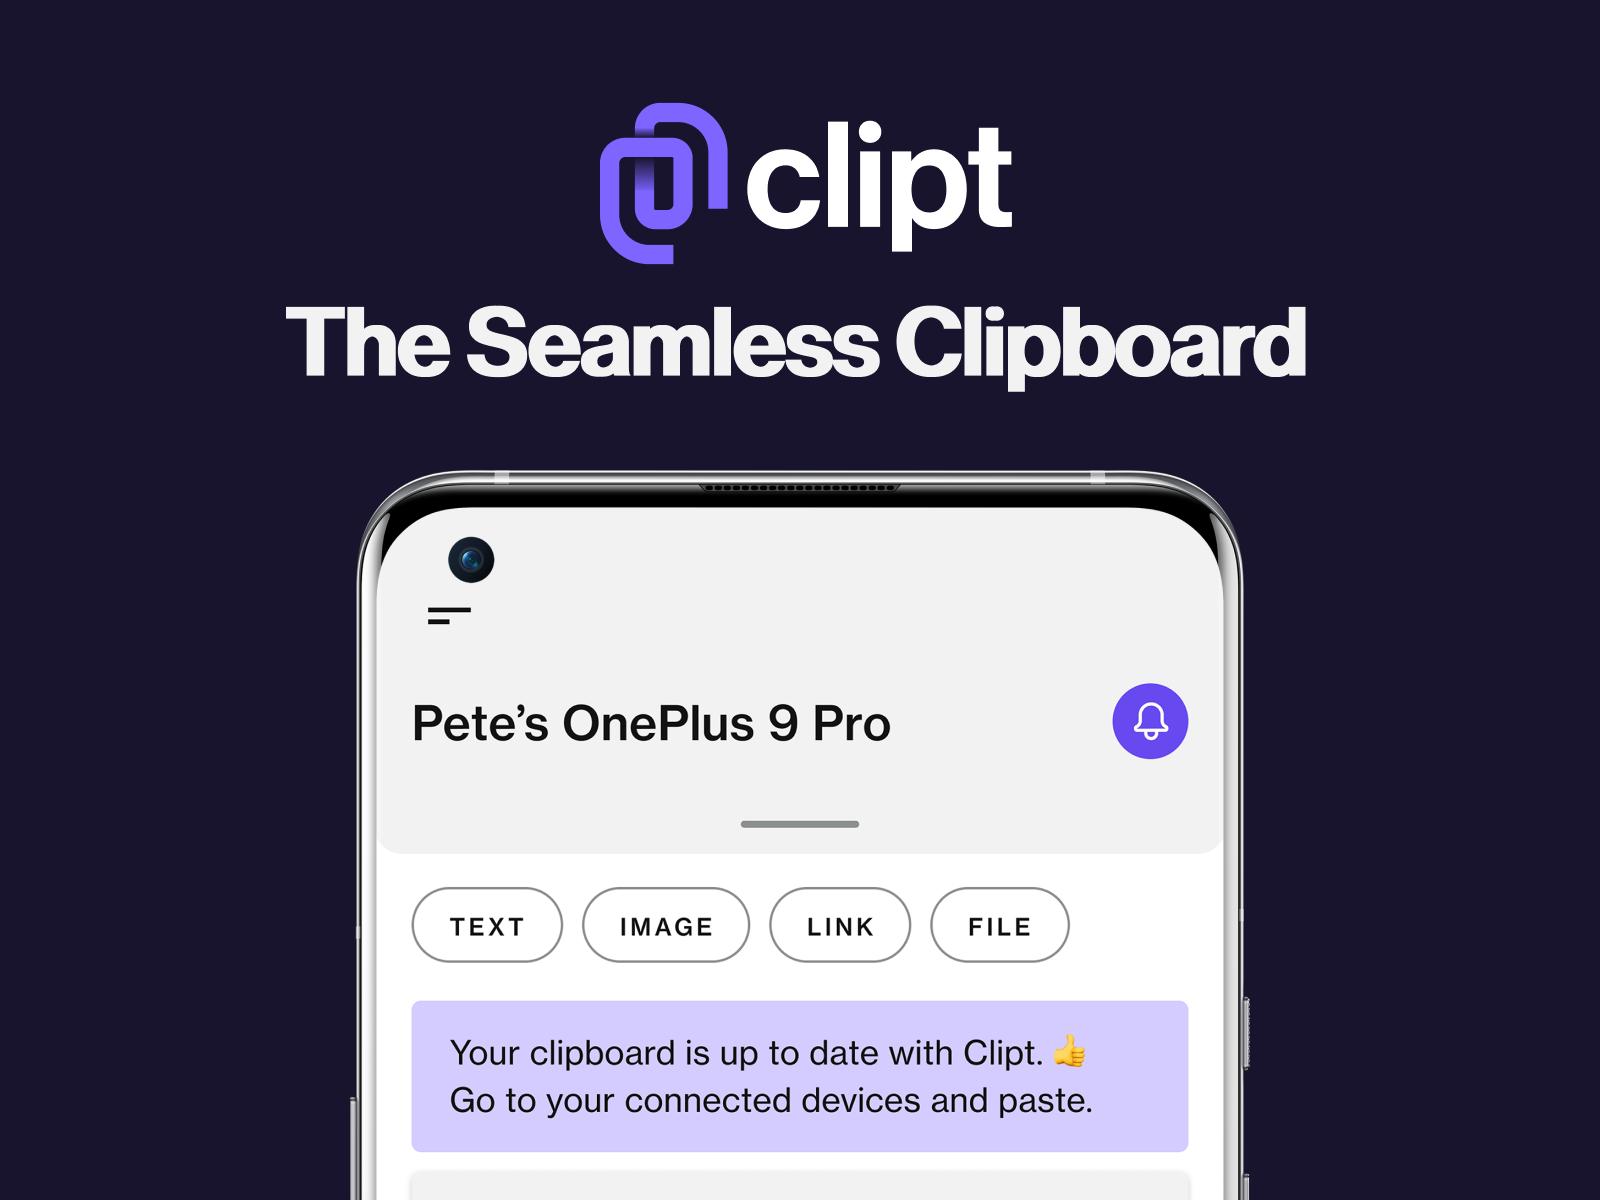 Clipt — The Seamless Clipboard